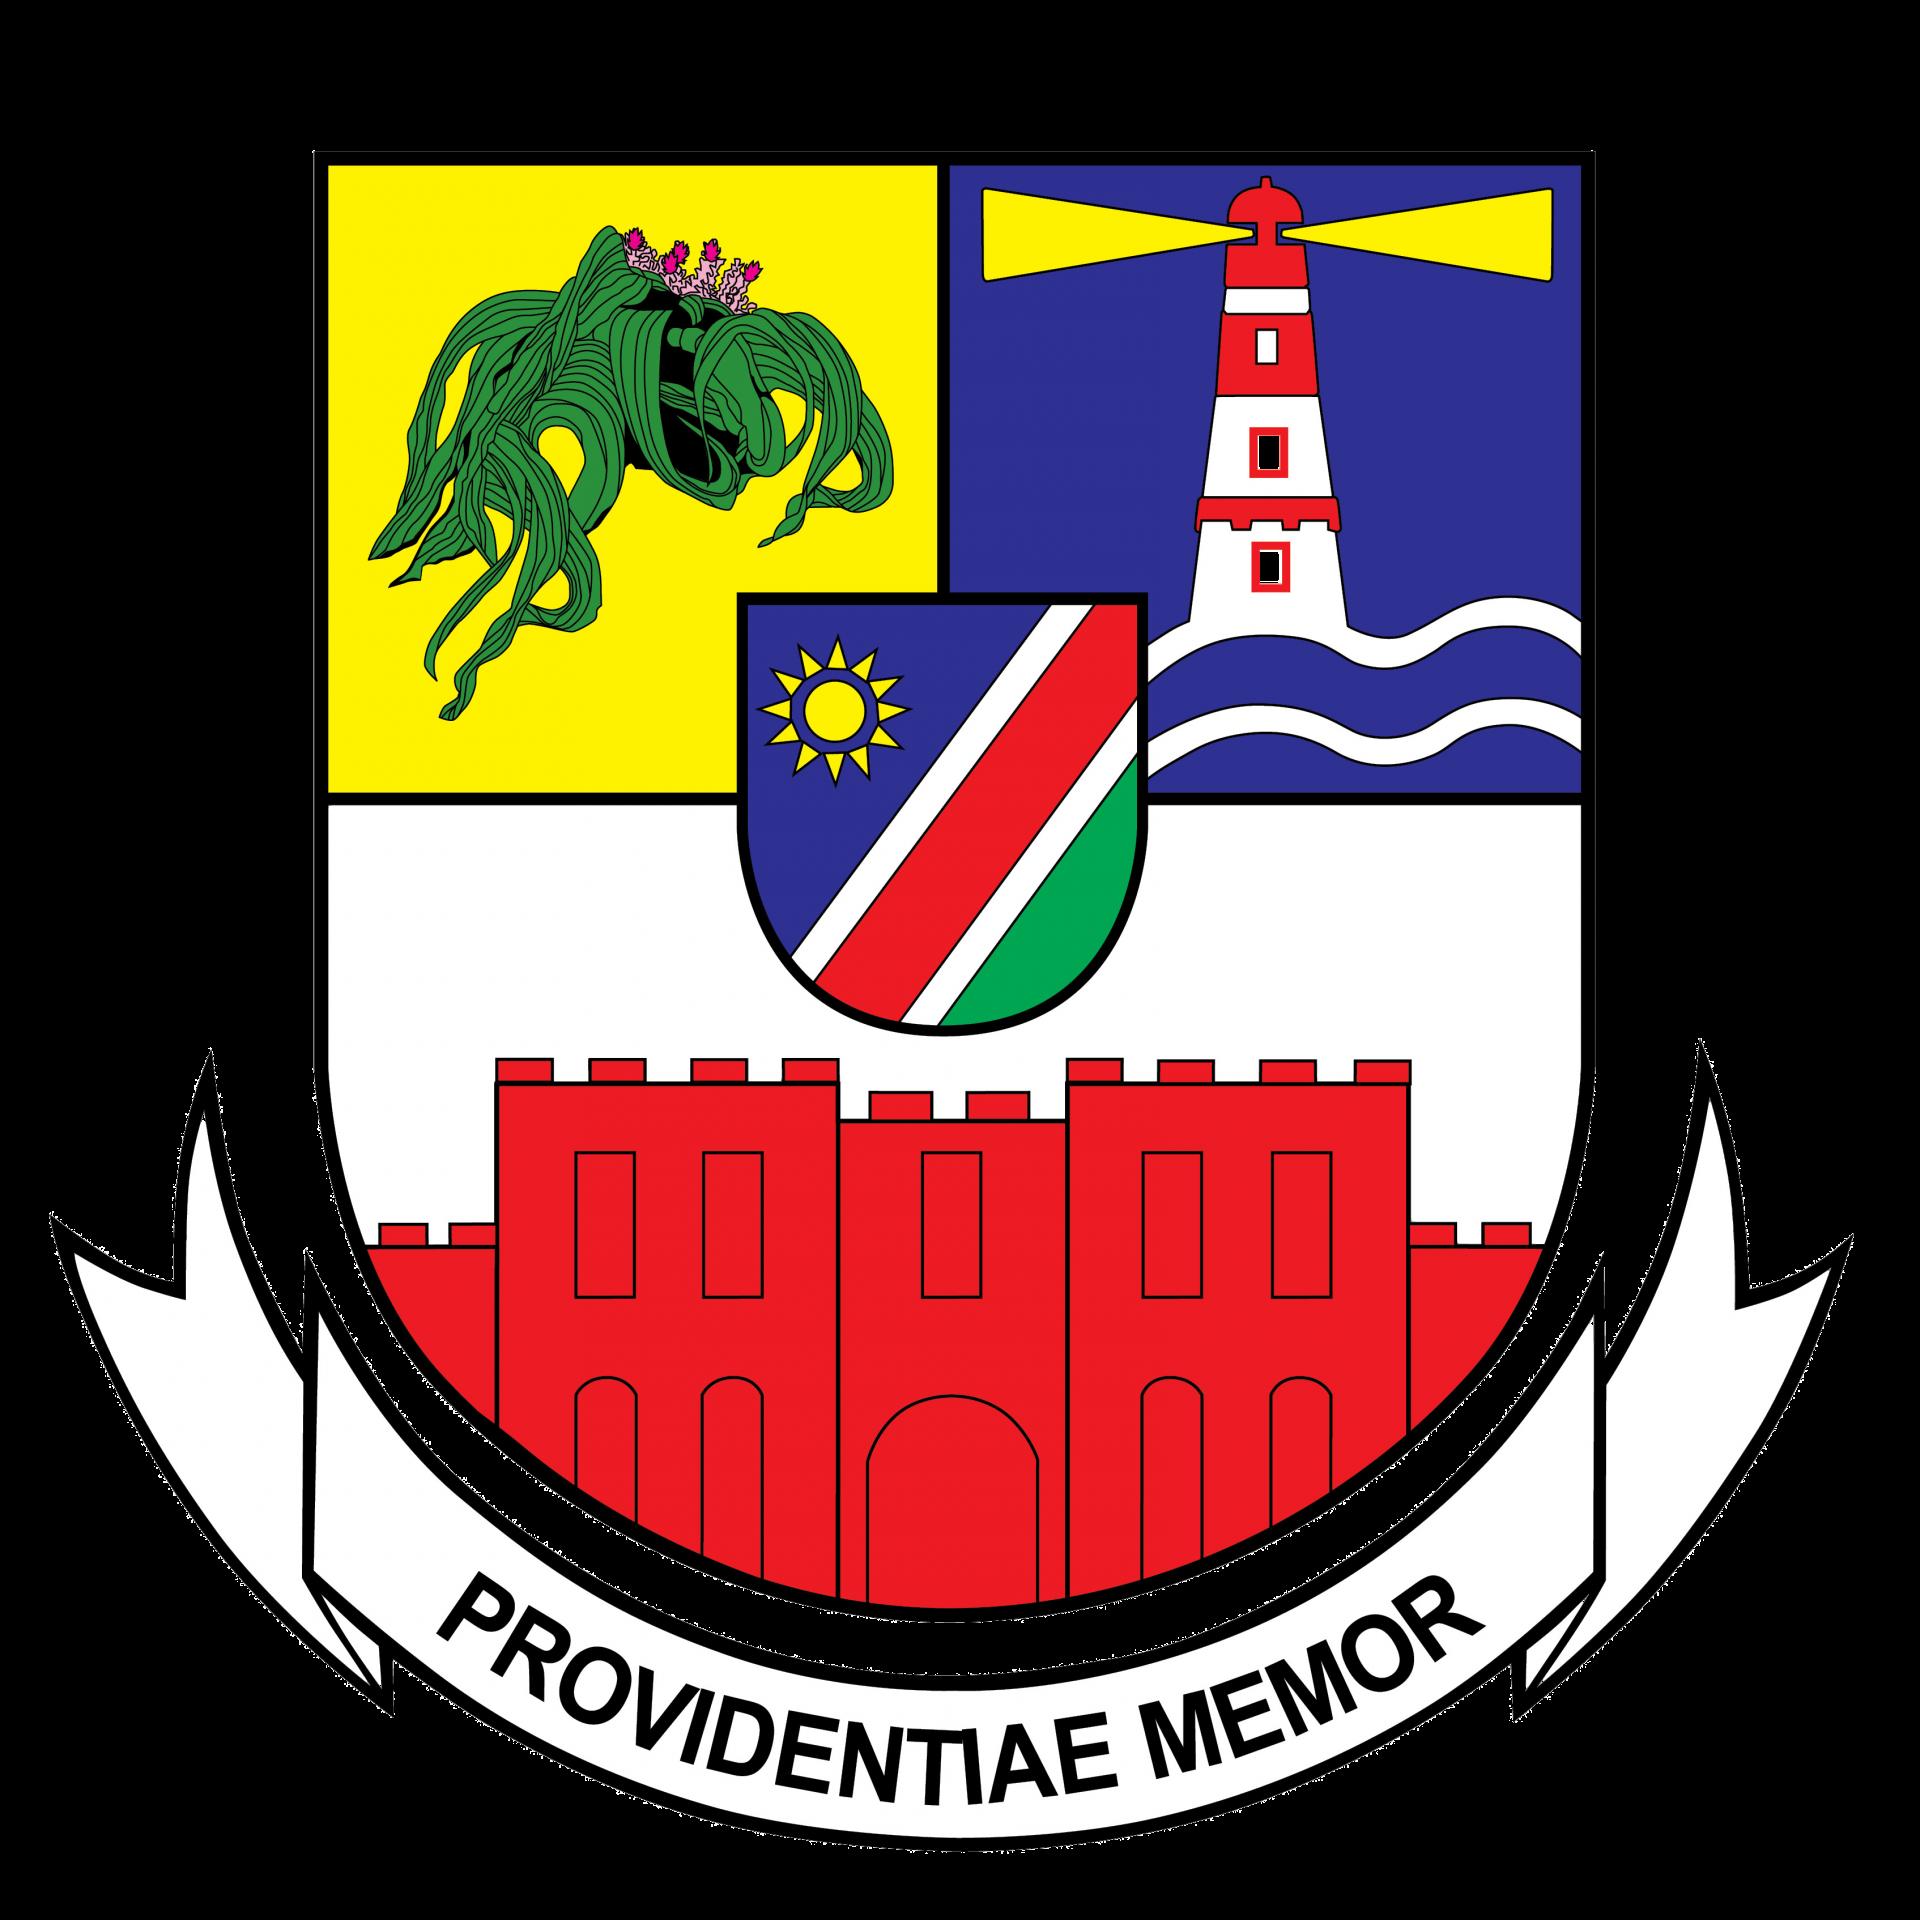 Municipality of Swakopmund